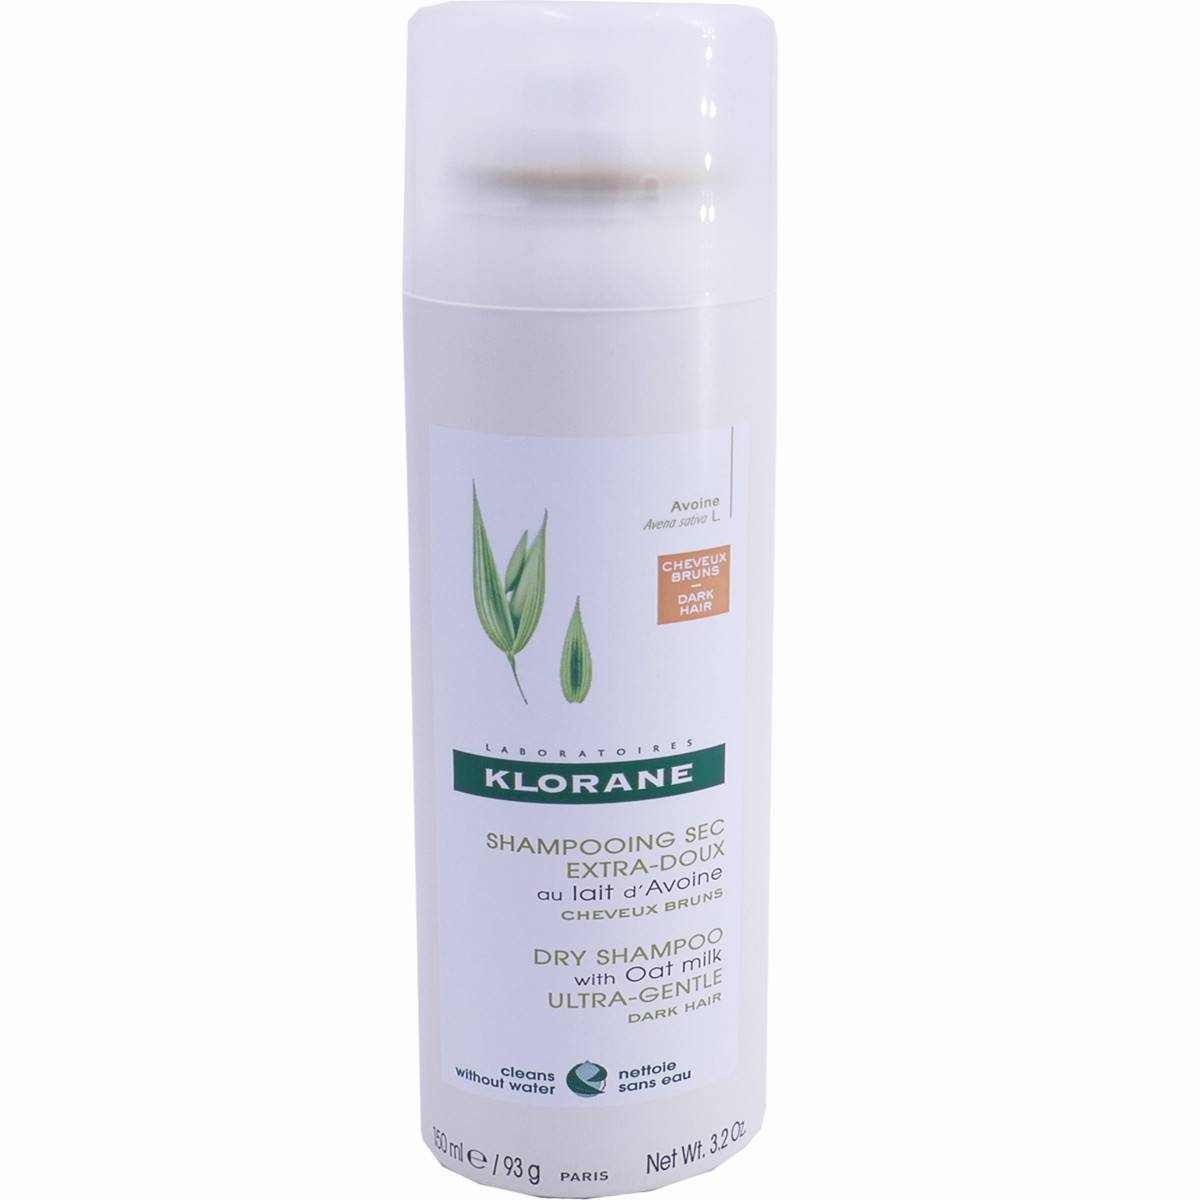 Klorane shampooing sec 150 ml cheveux brun